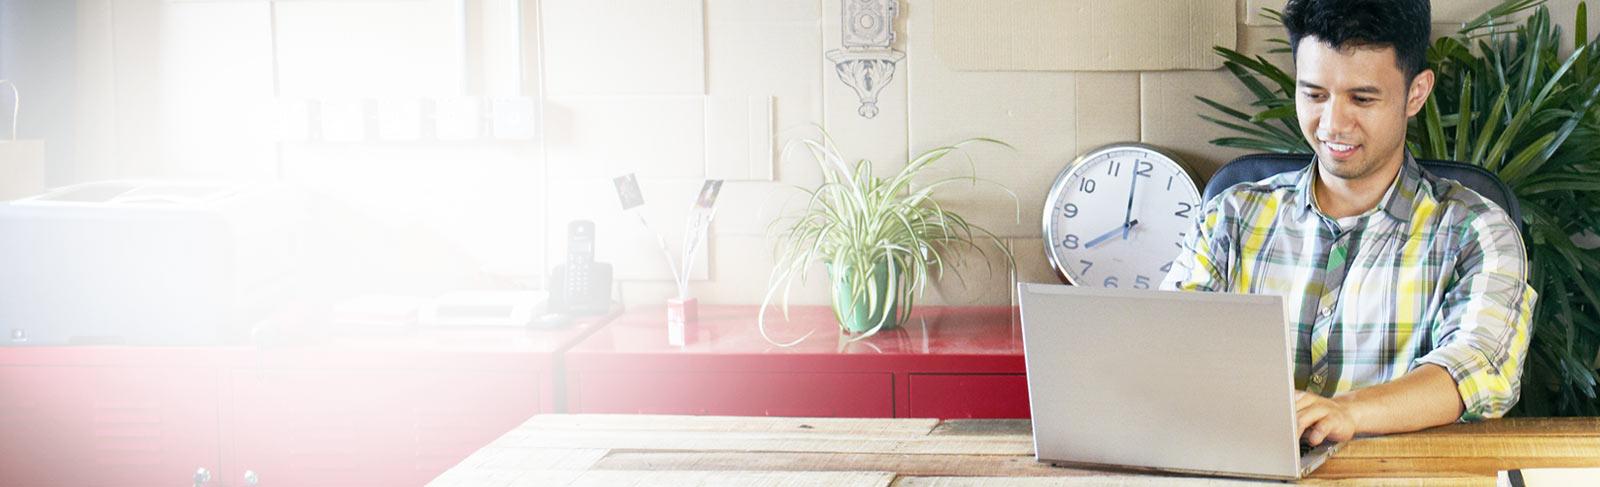 acheter microsoft office famille et petite entreprise 2016. Black Bedroom Furniture Sets. Home Design Ideas